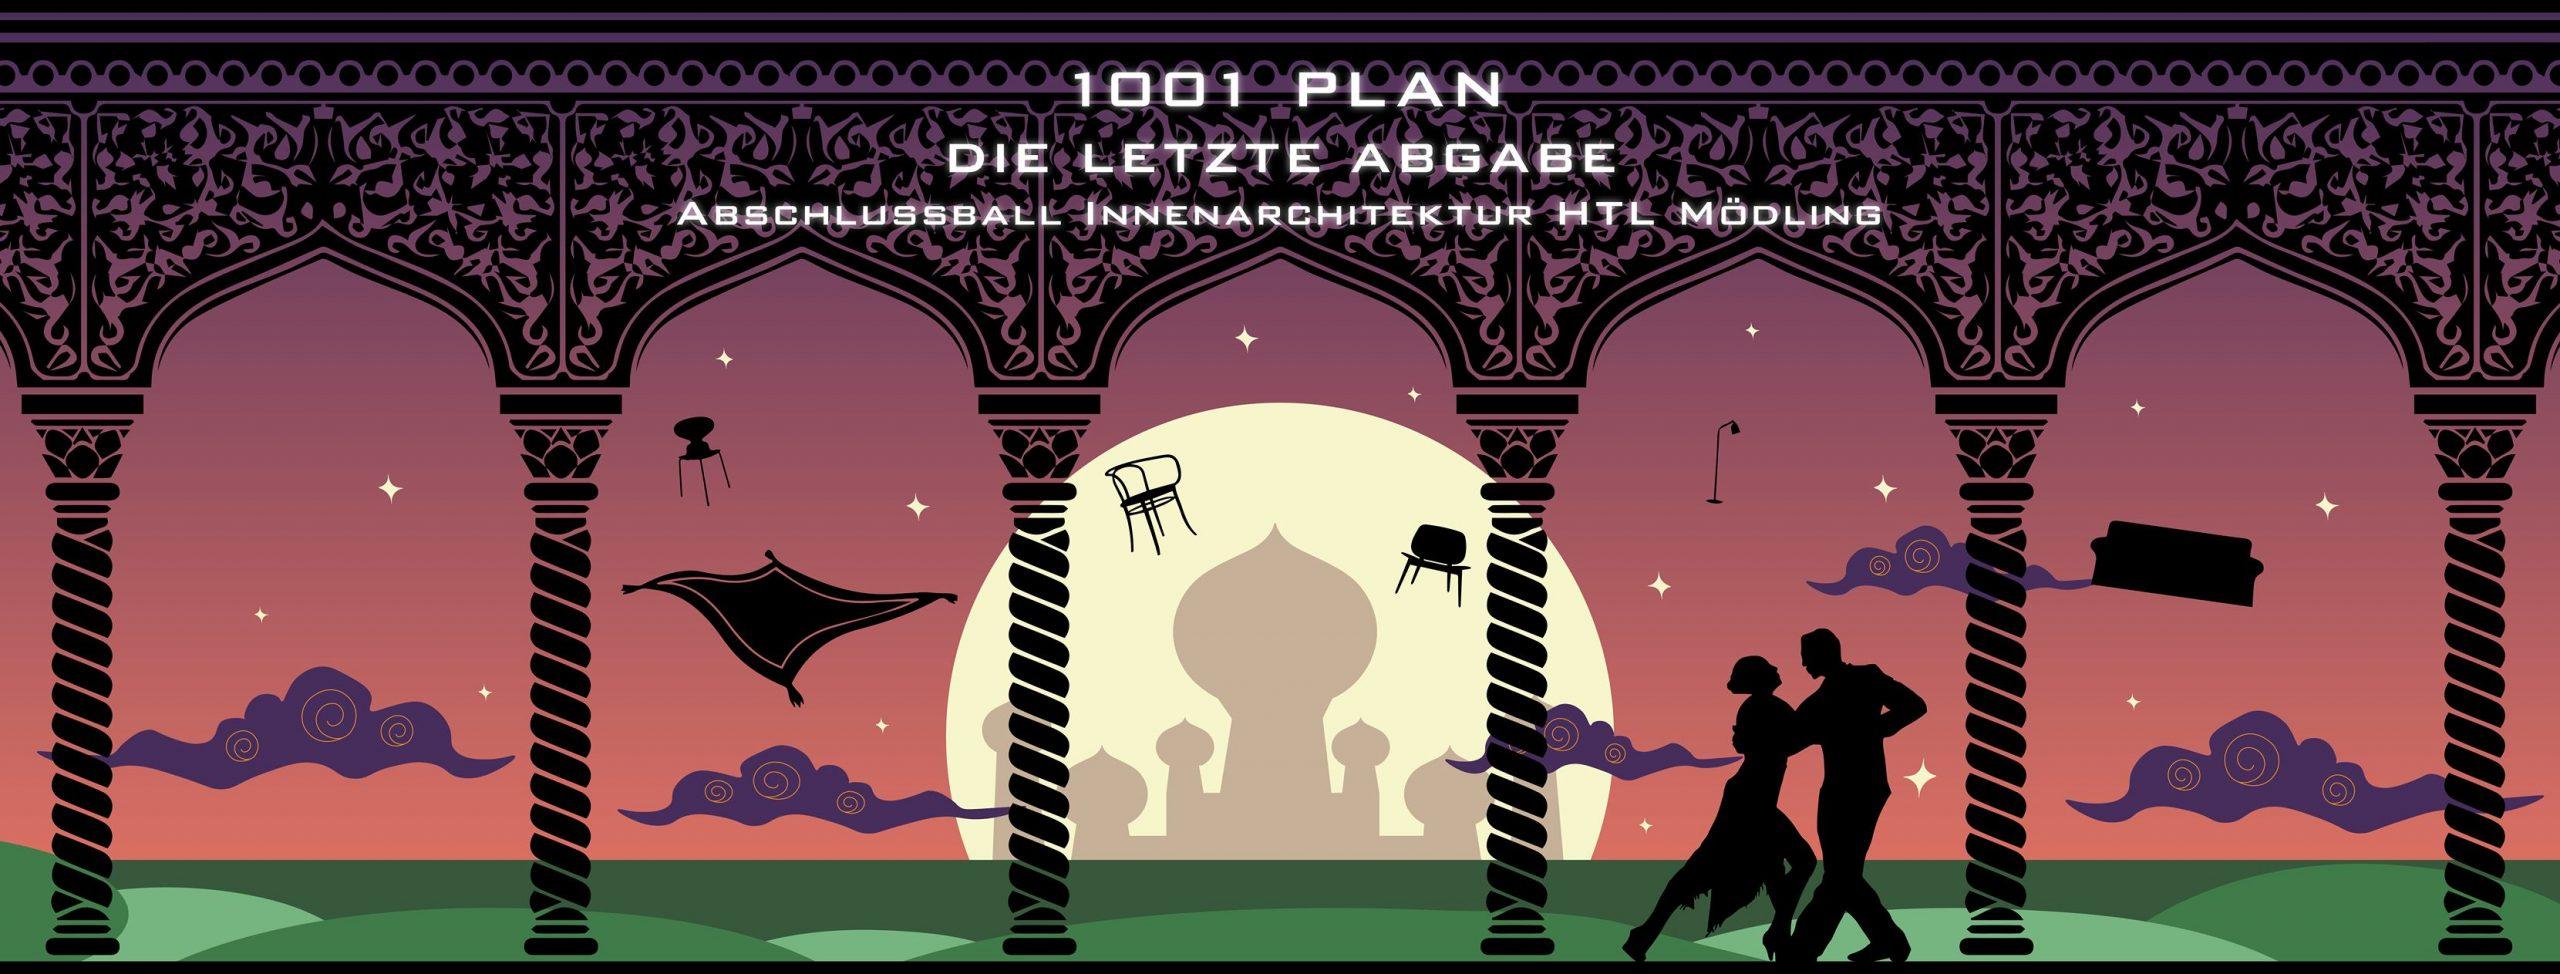 1001 Plan - die letzte Abgabe am 29. February 2020 @ Sparkassensaal Wiener Neustadt.